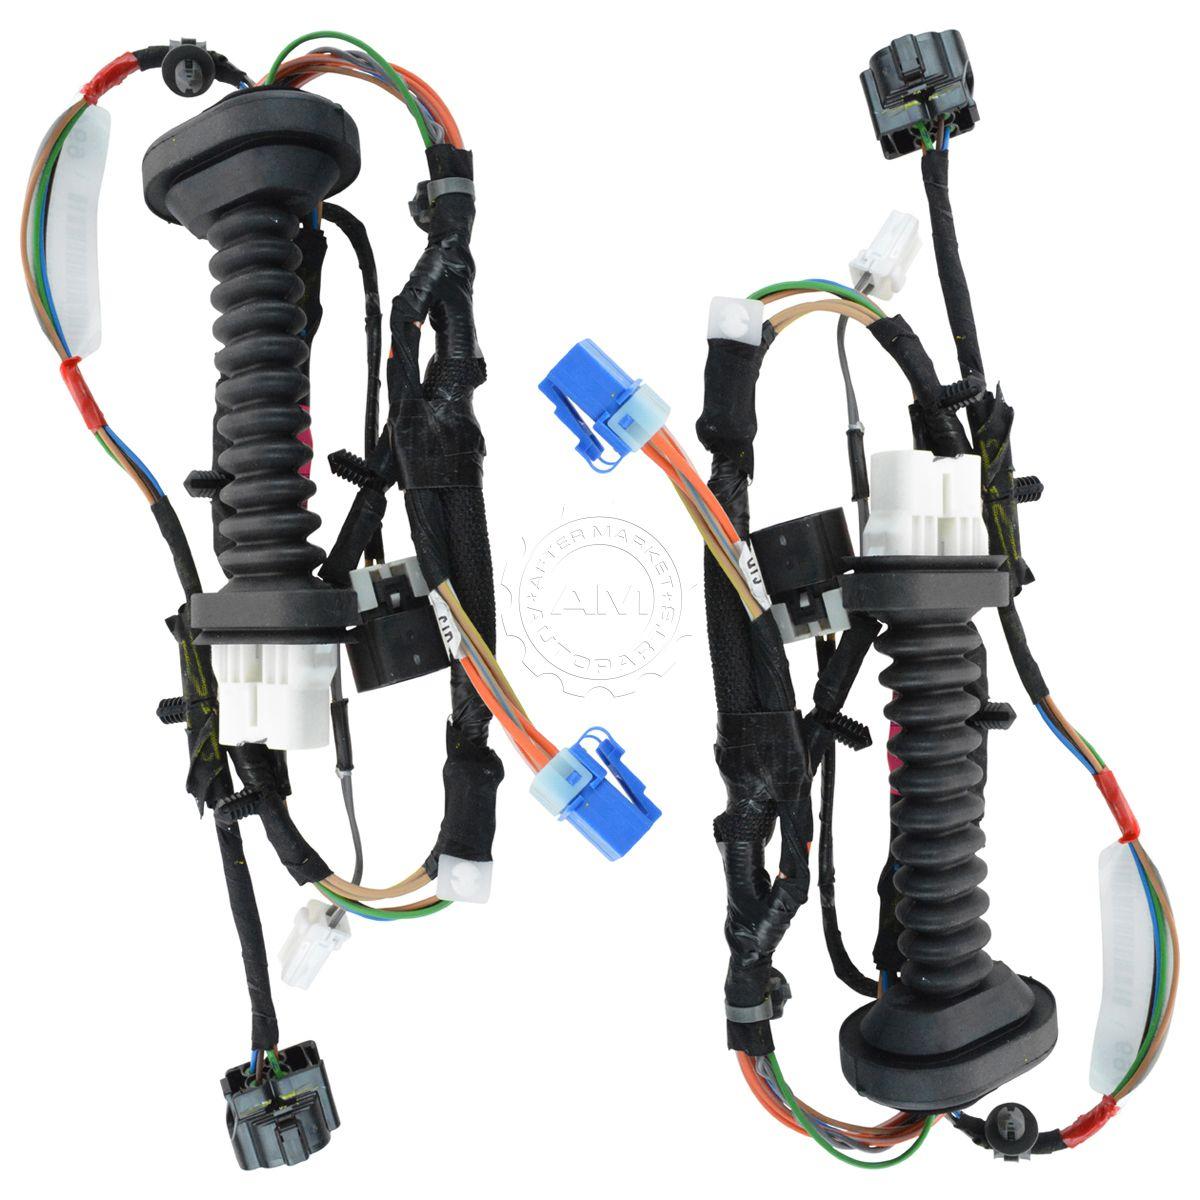 oem 56051694aa rear door electrical wiring harness lh & lh pair for ram  pickup